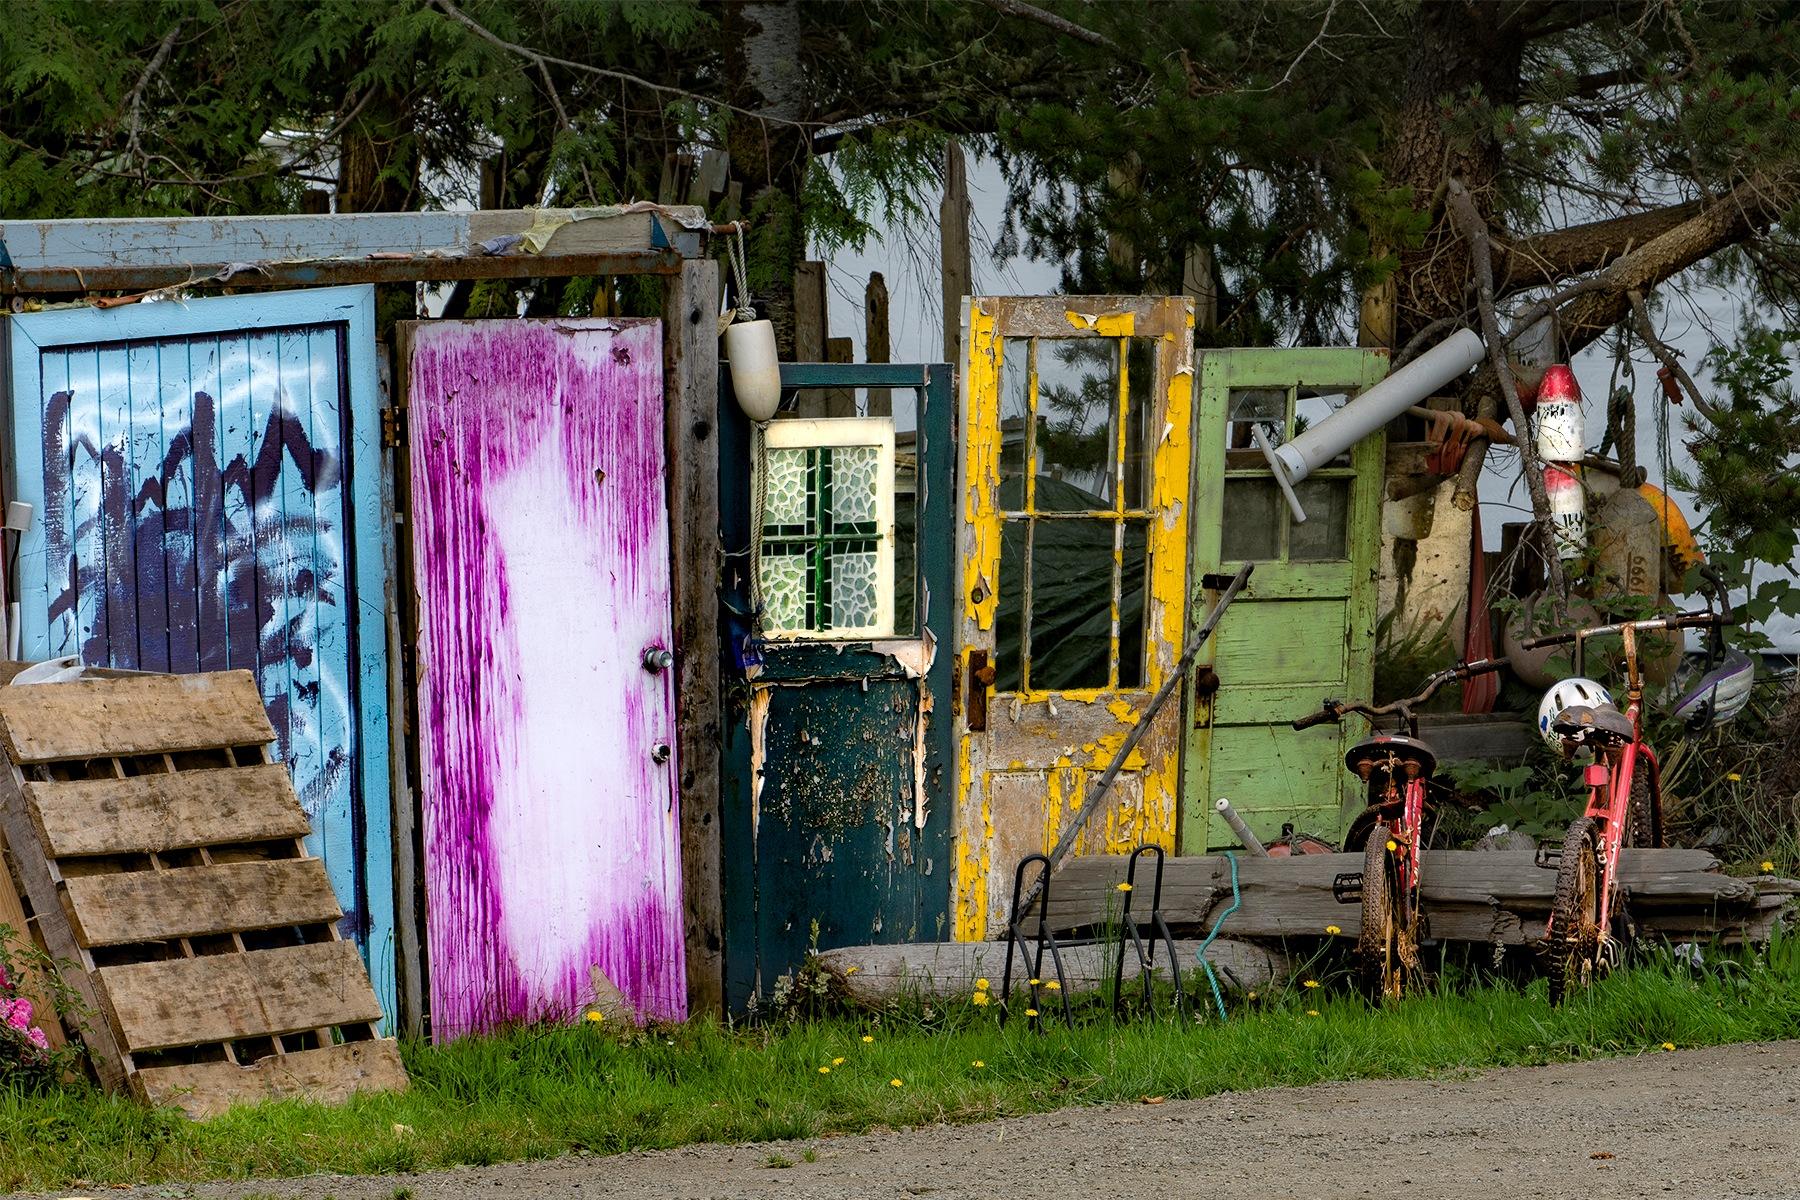 Painted Doors & Bicycles by markj